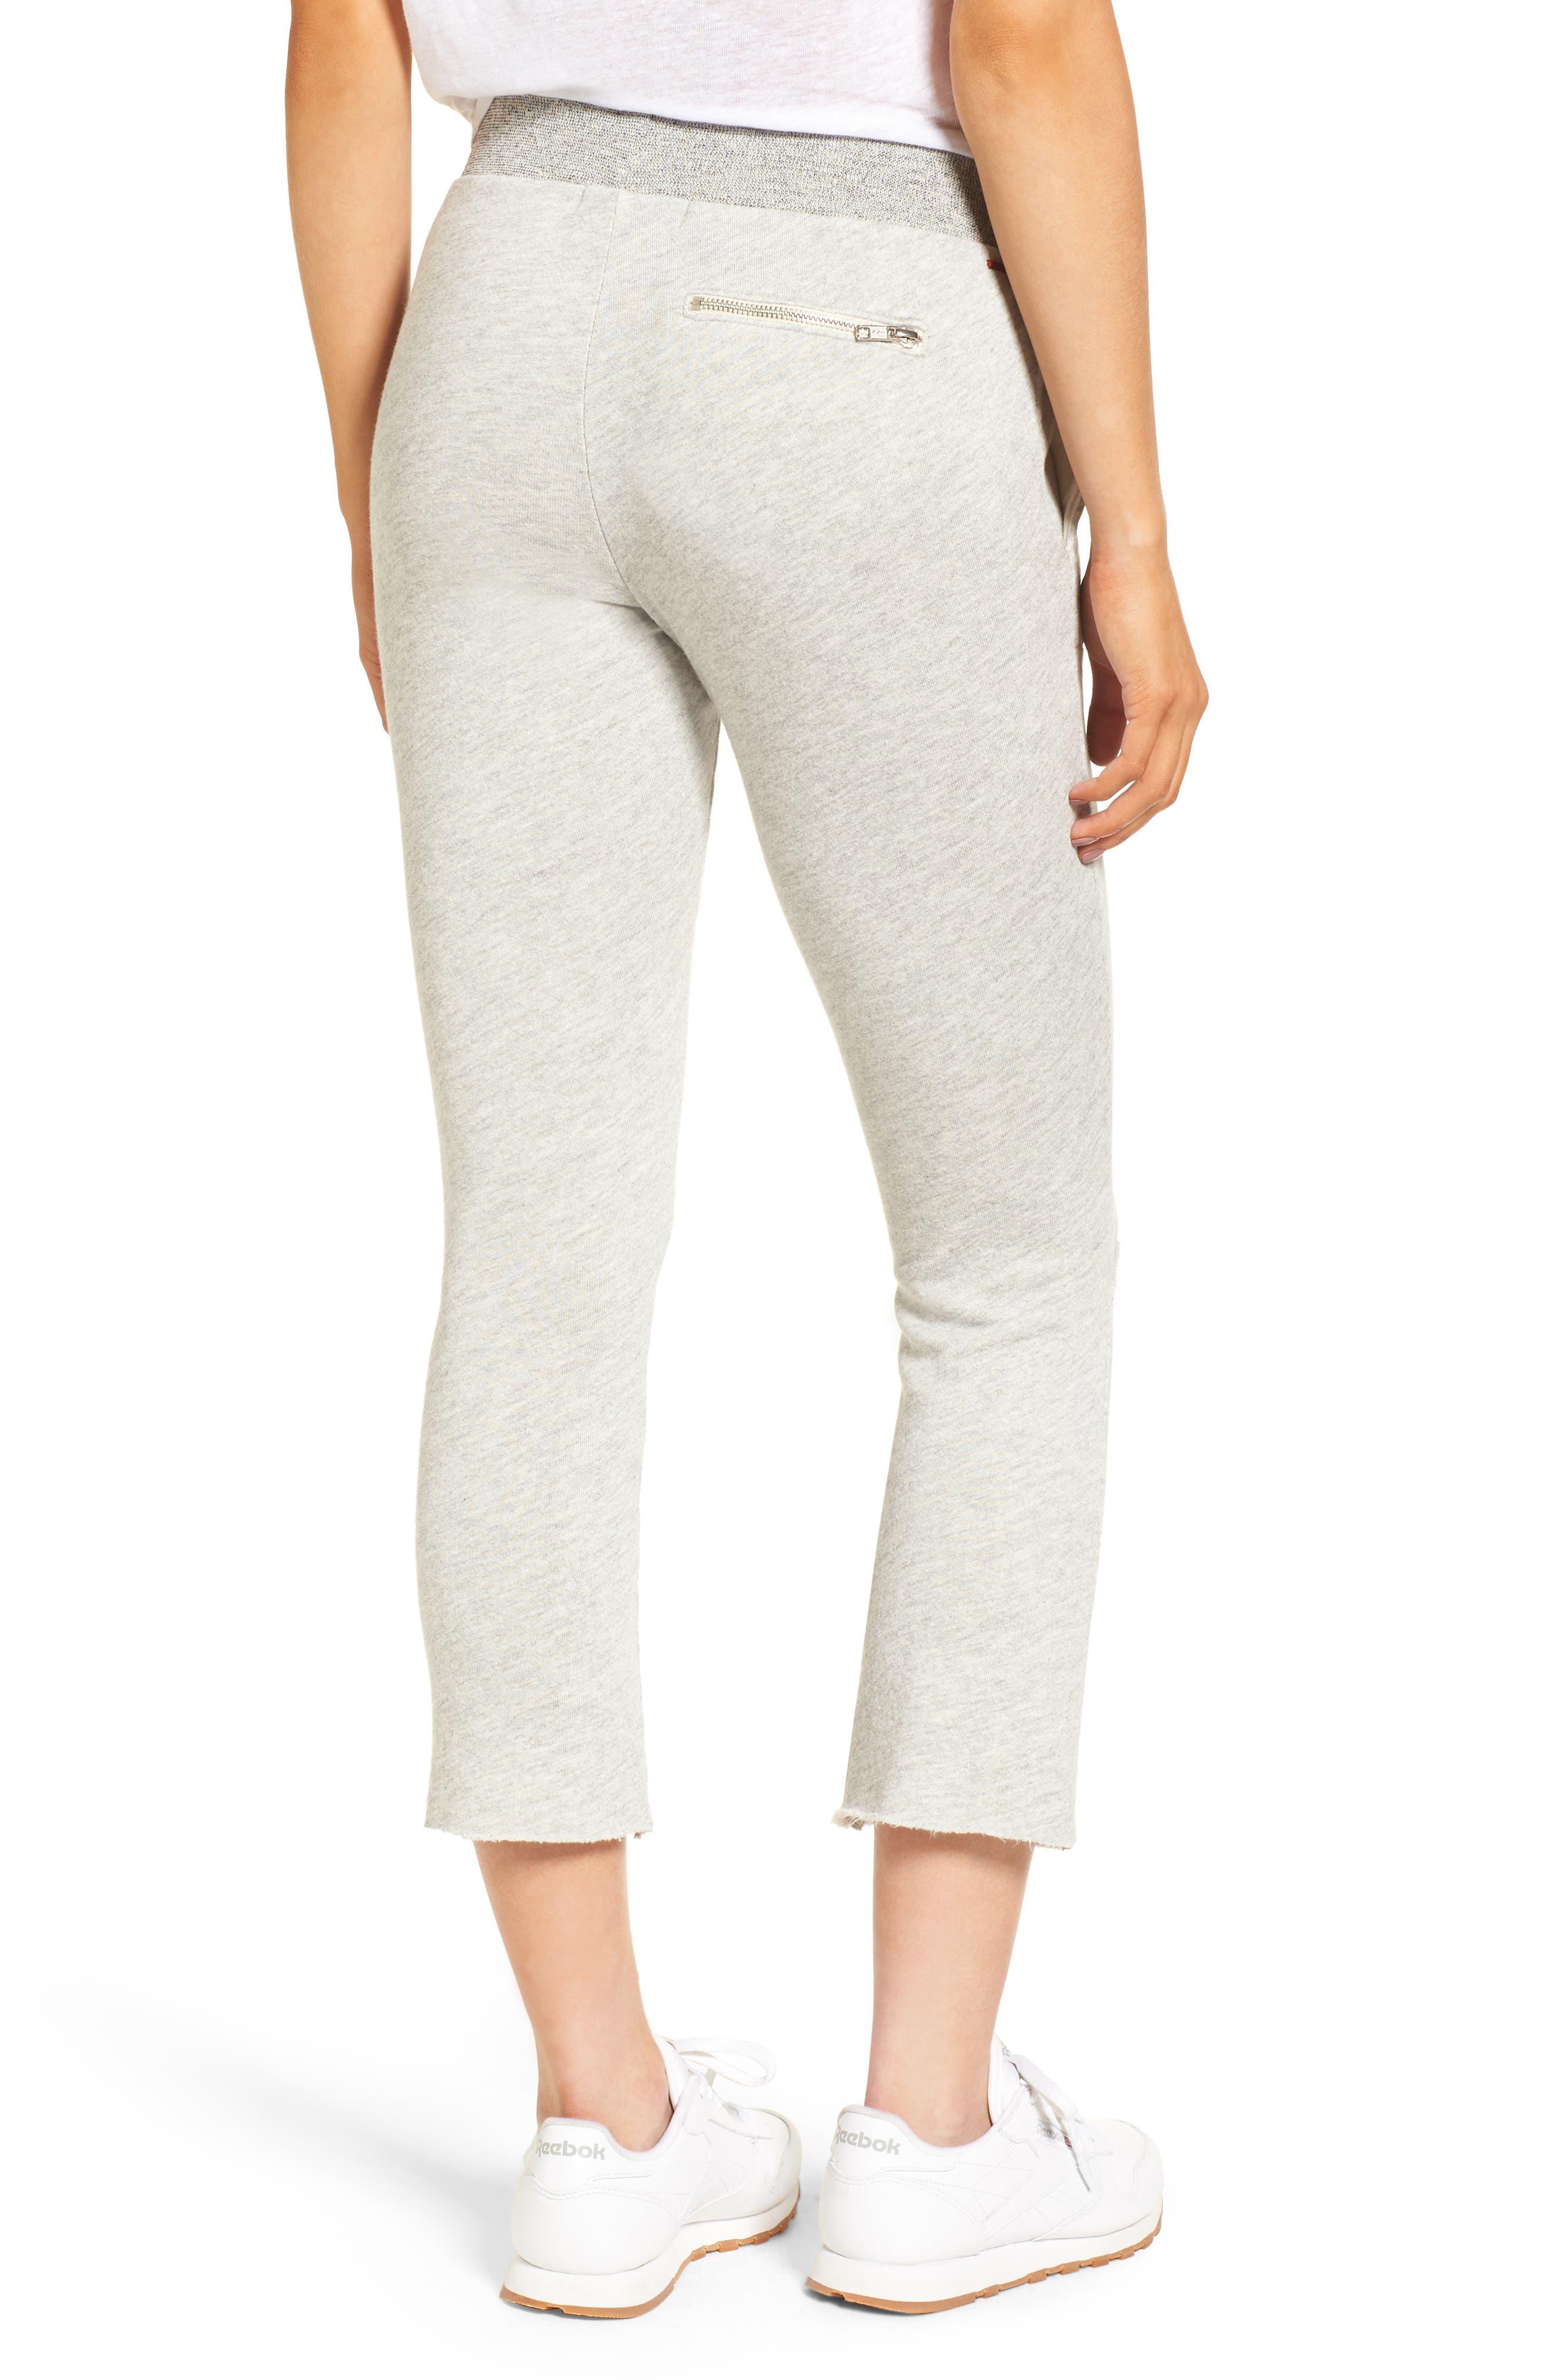 Malibu Slit Knee Sweatpants,                             Alternate thumbnail 2, color,                             Heather Grey